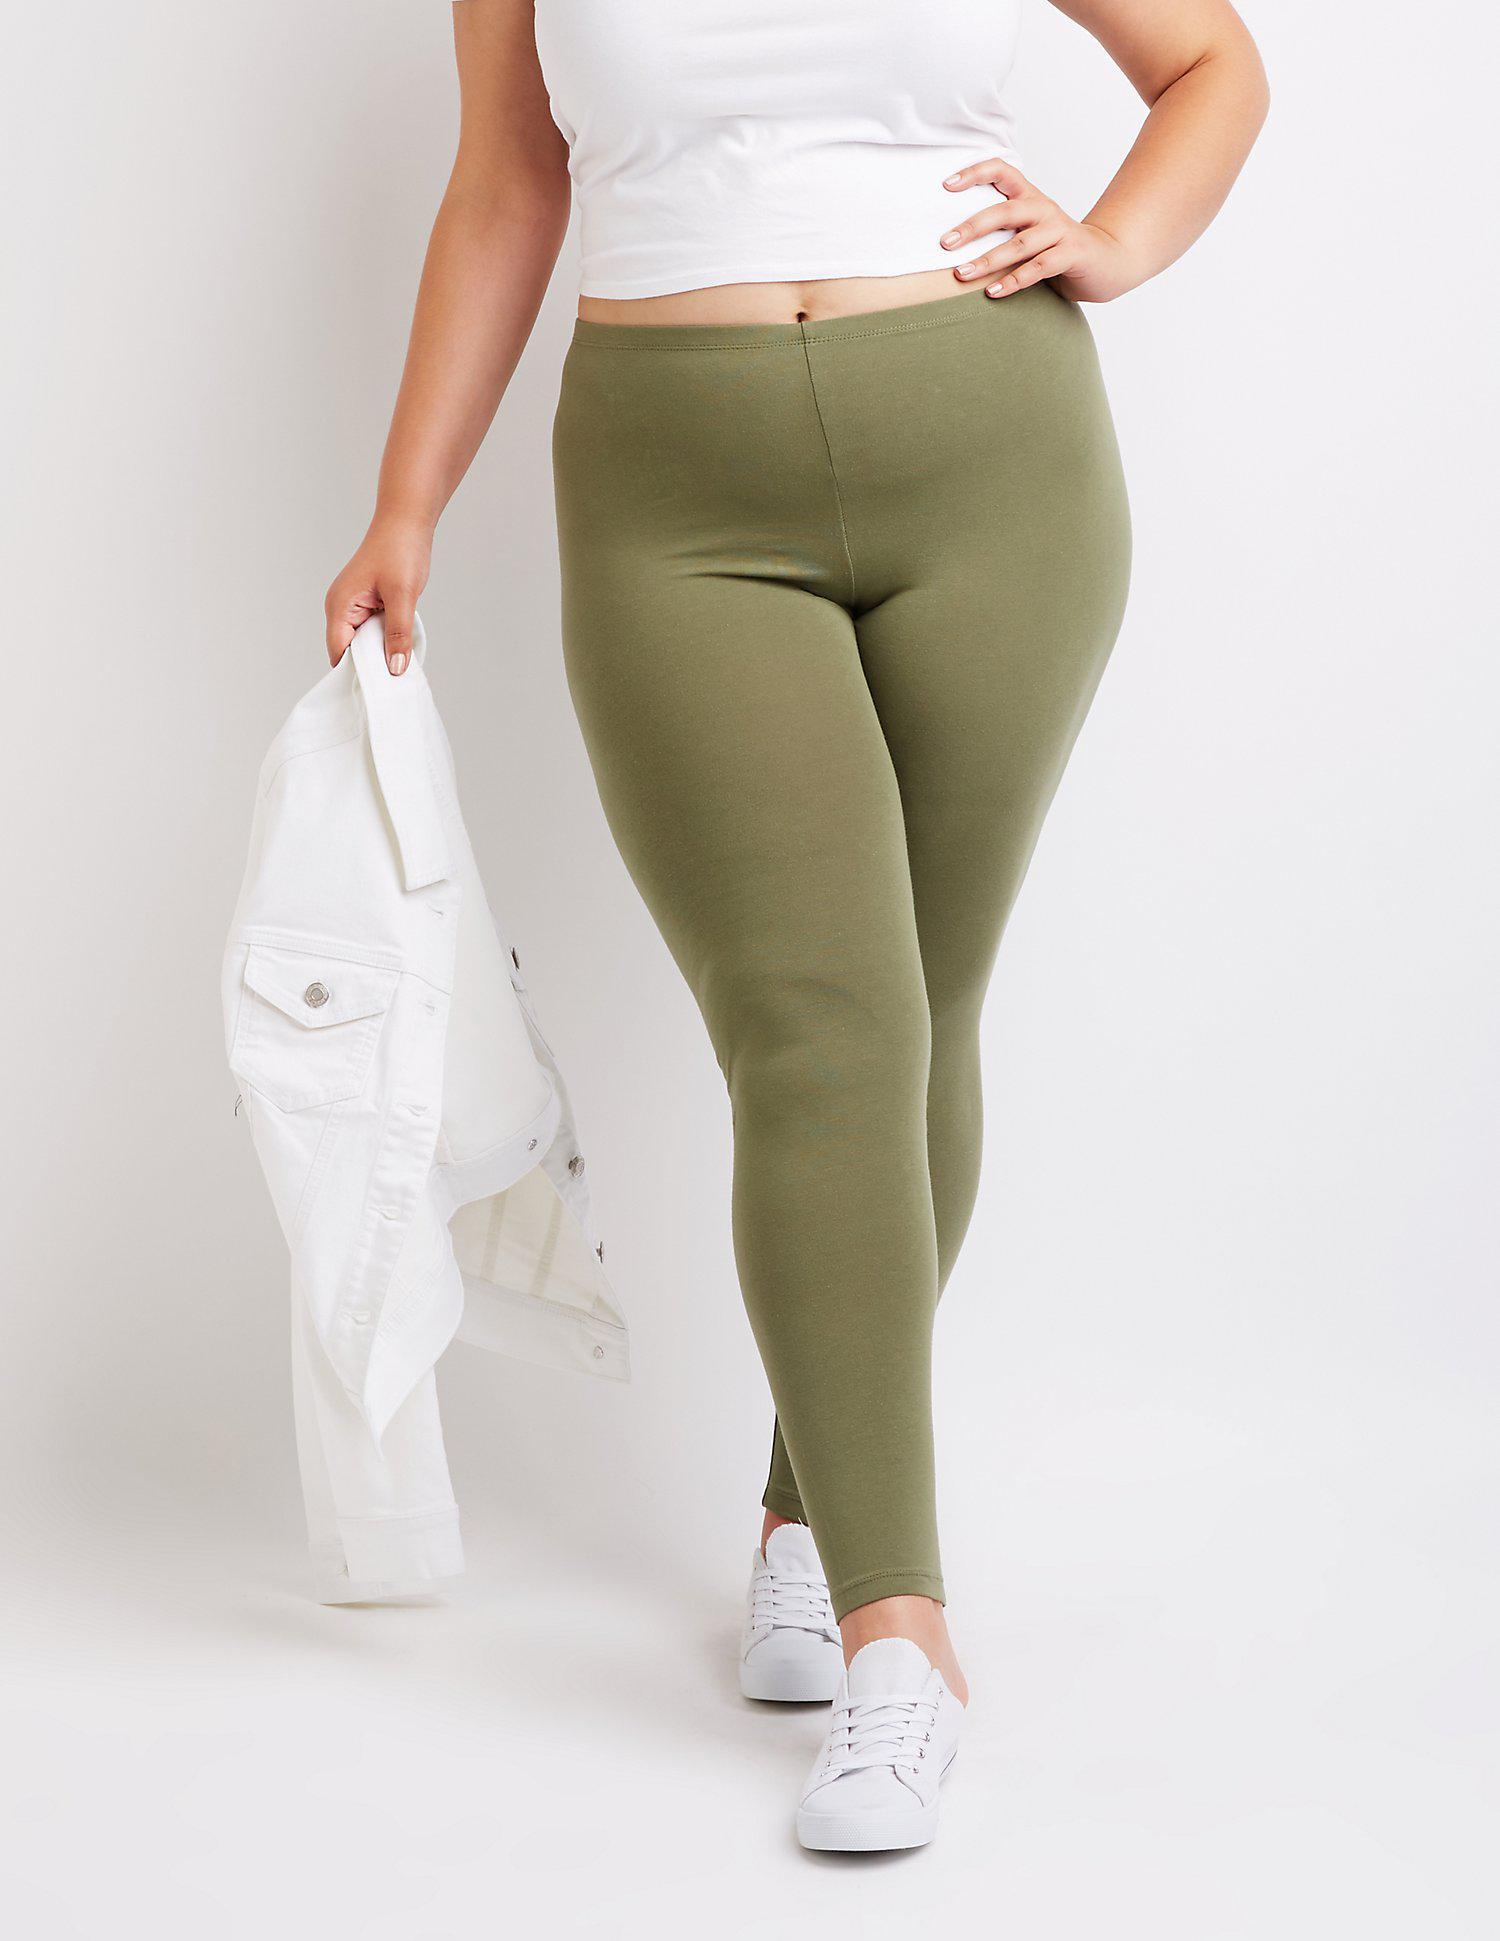 da6dbe0cd44bbe Lyst - Charlotte Russe Plus Size Stretch Cotton Leggings in Green ...